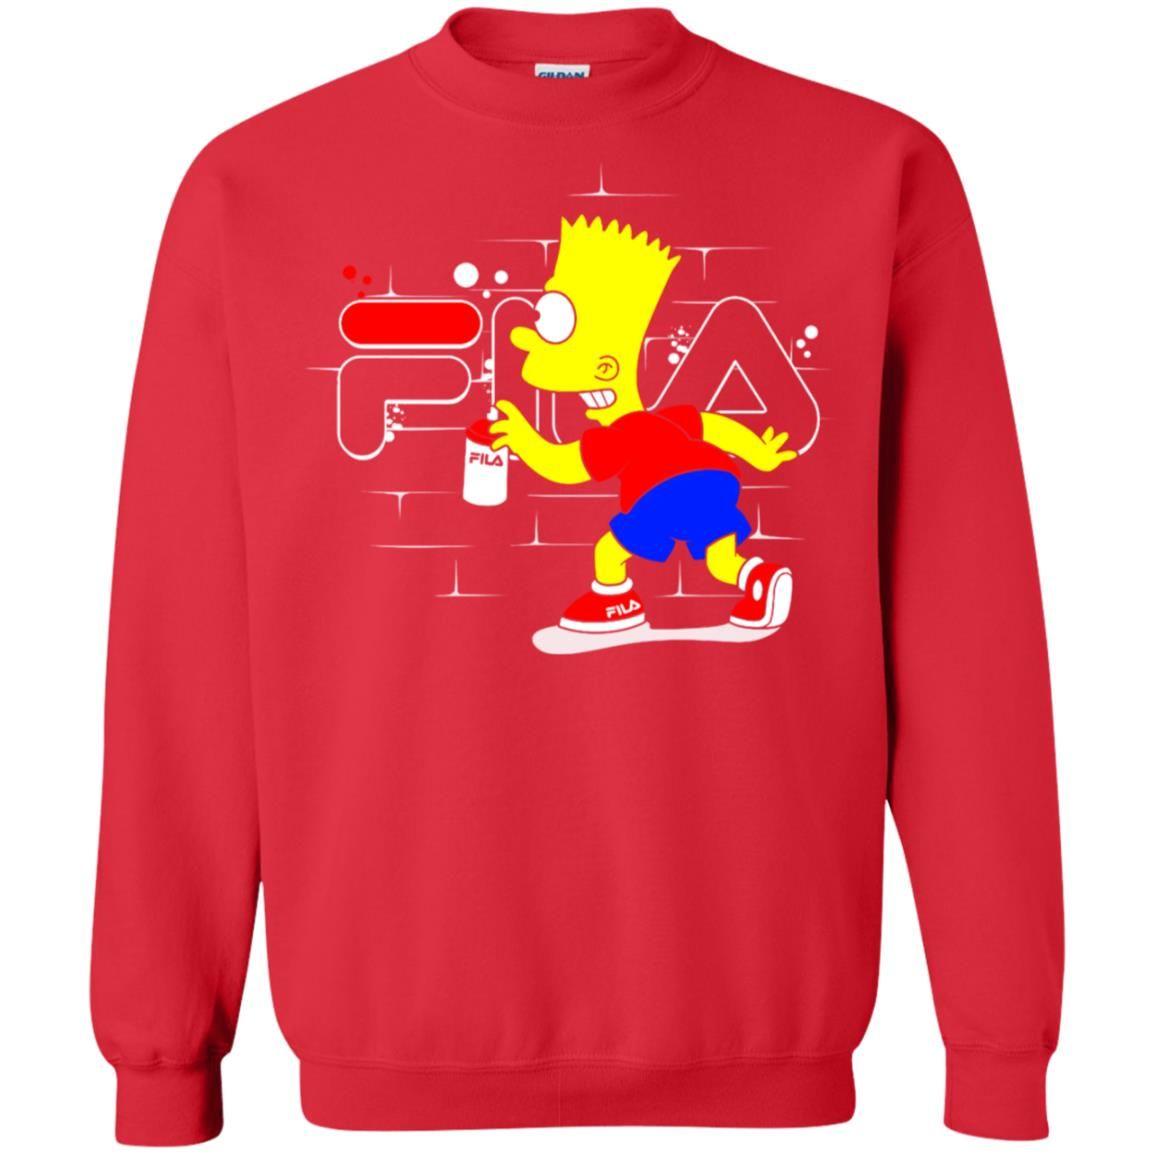 Fila Bart Simpson Pullover Sweatshirt Zamrie Sweatshirts Bart Simpson Bart [ 1155 x 1155 Pixel ]